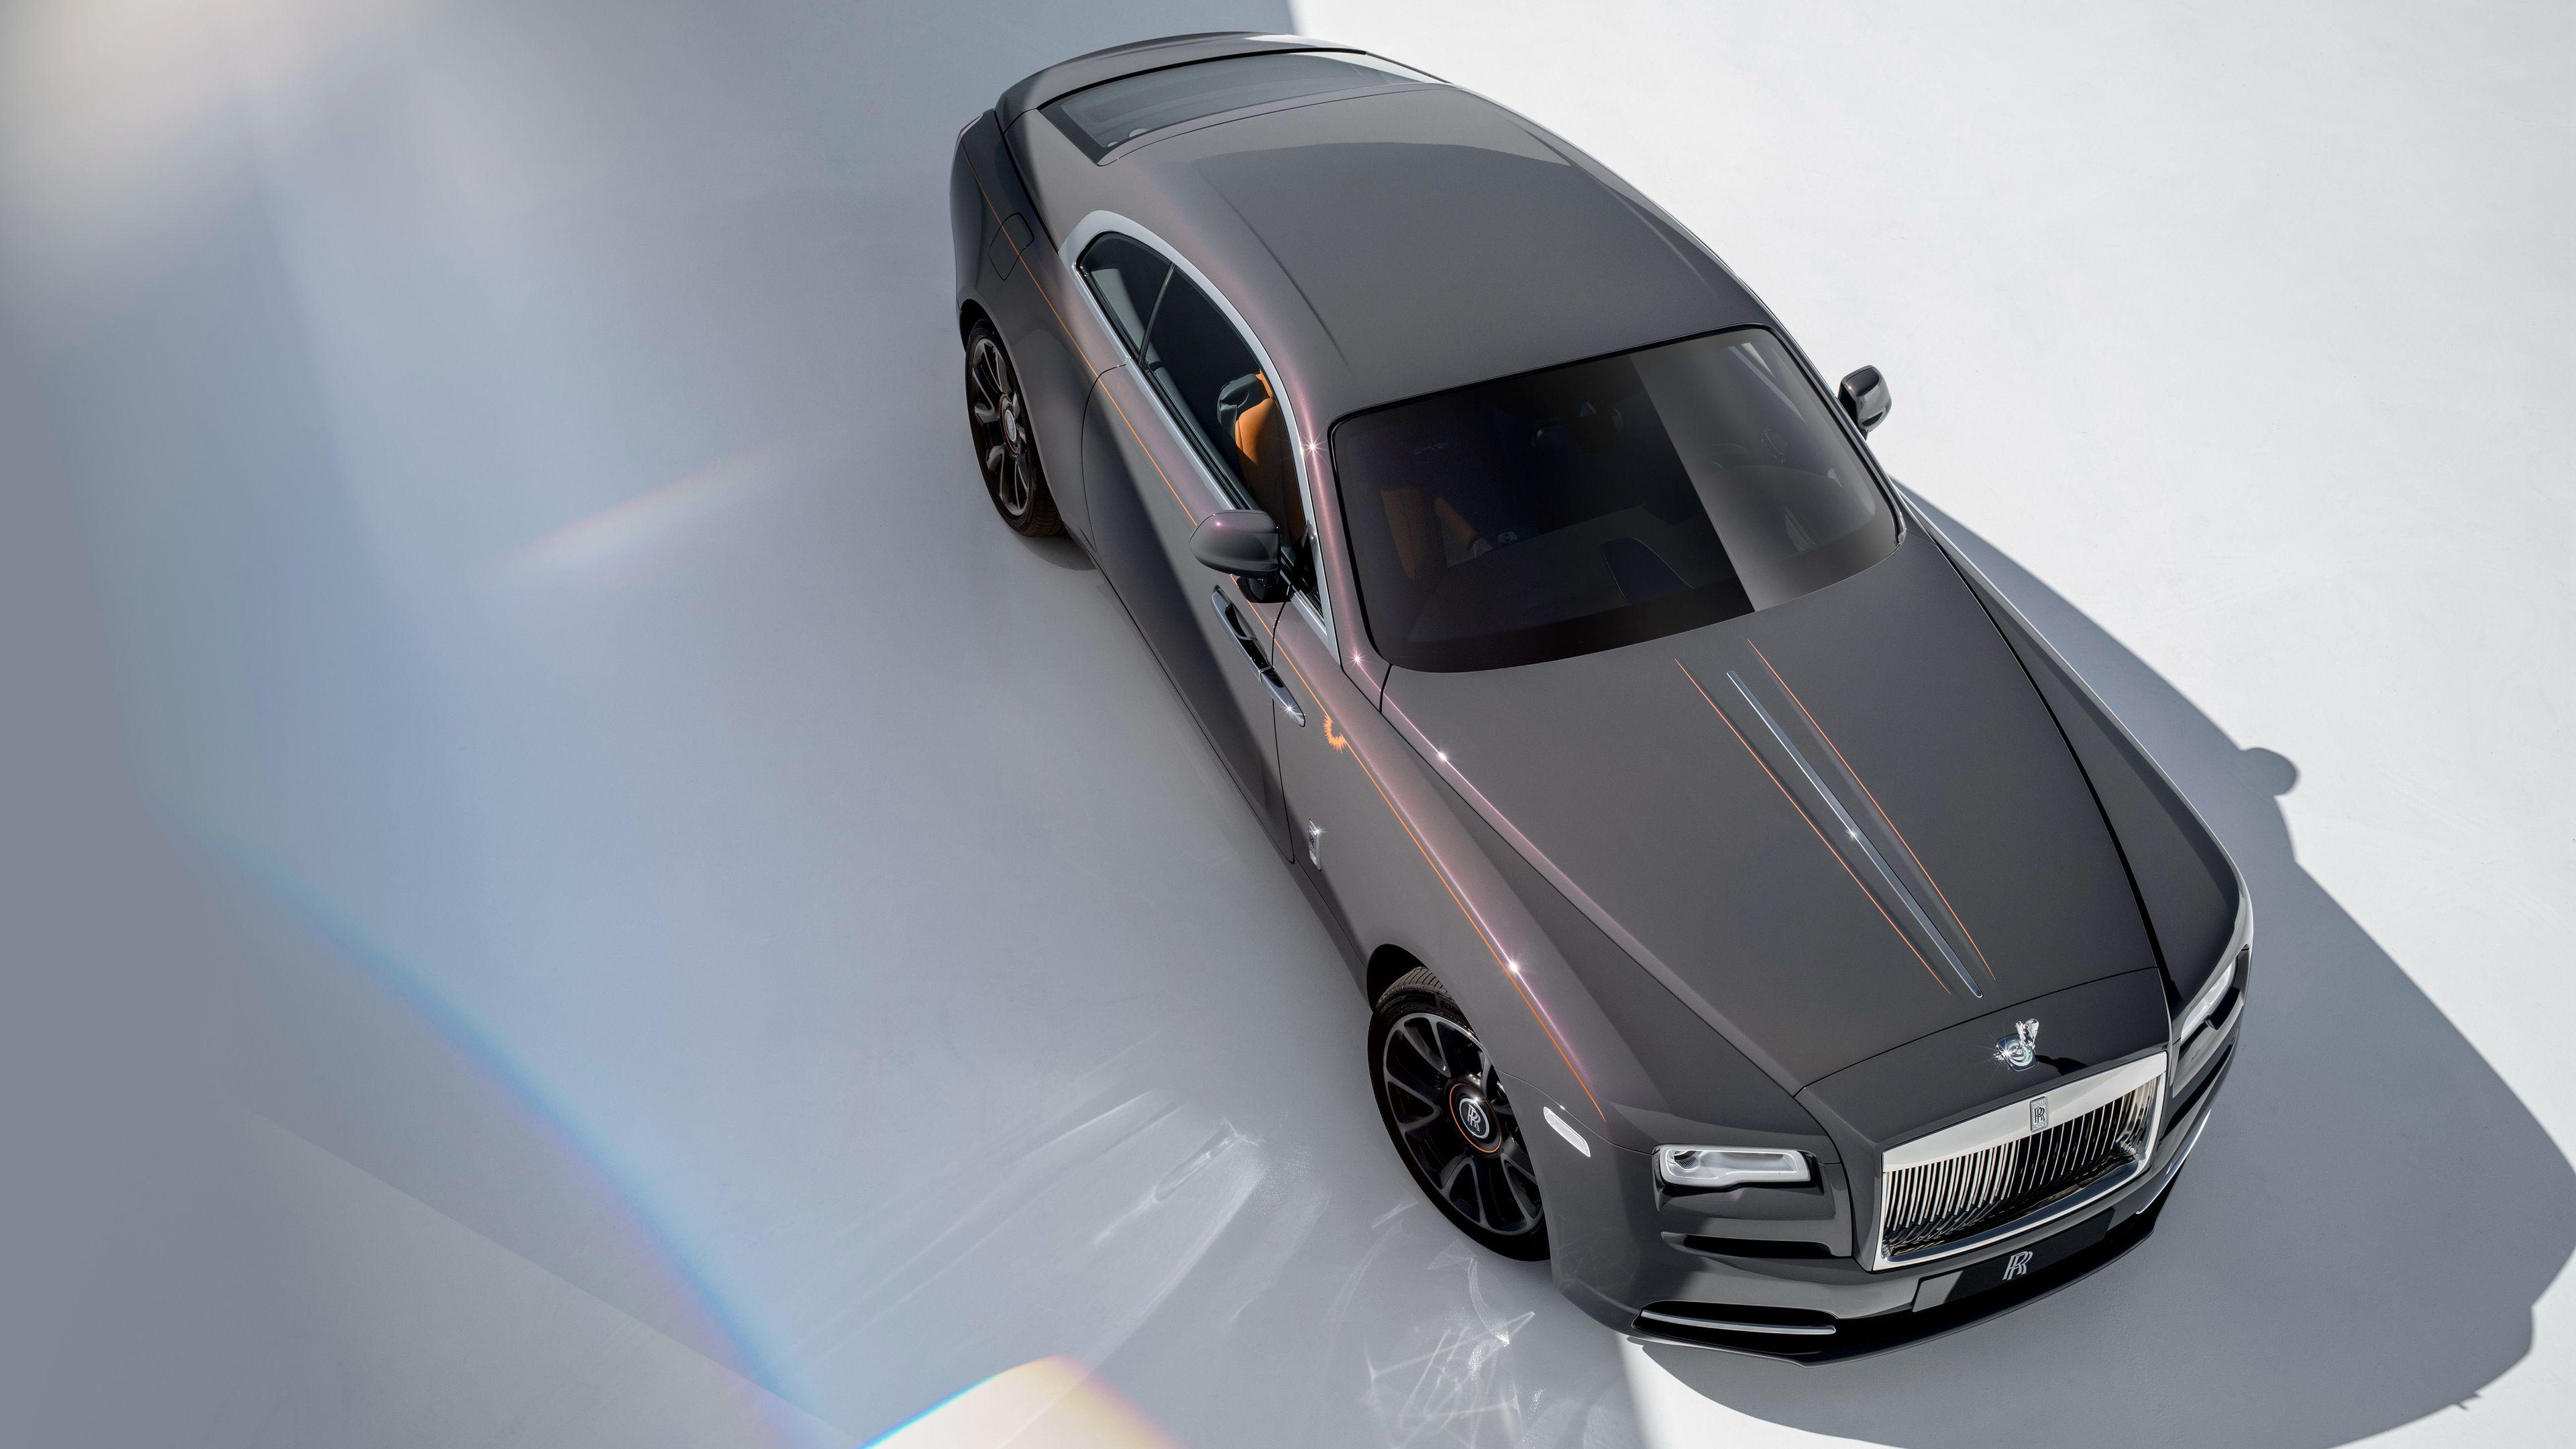 Rolls Royce Wraith Luminary Collection 2018 4k rolls royce wraith wallpapers, ro…